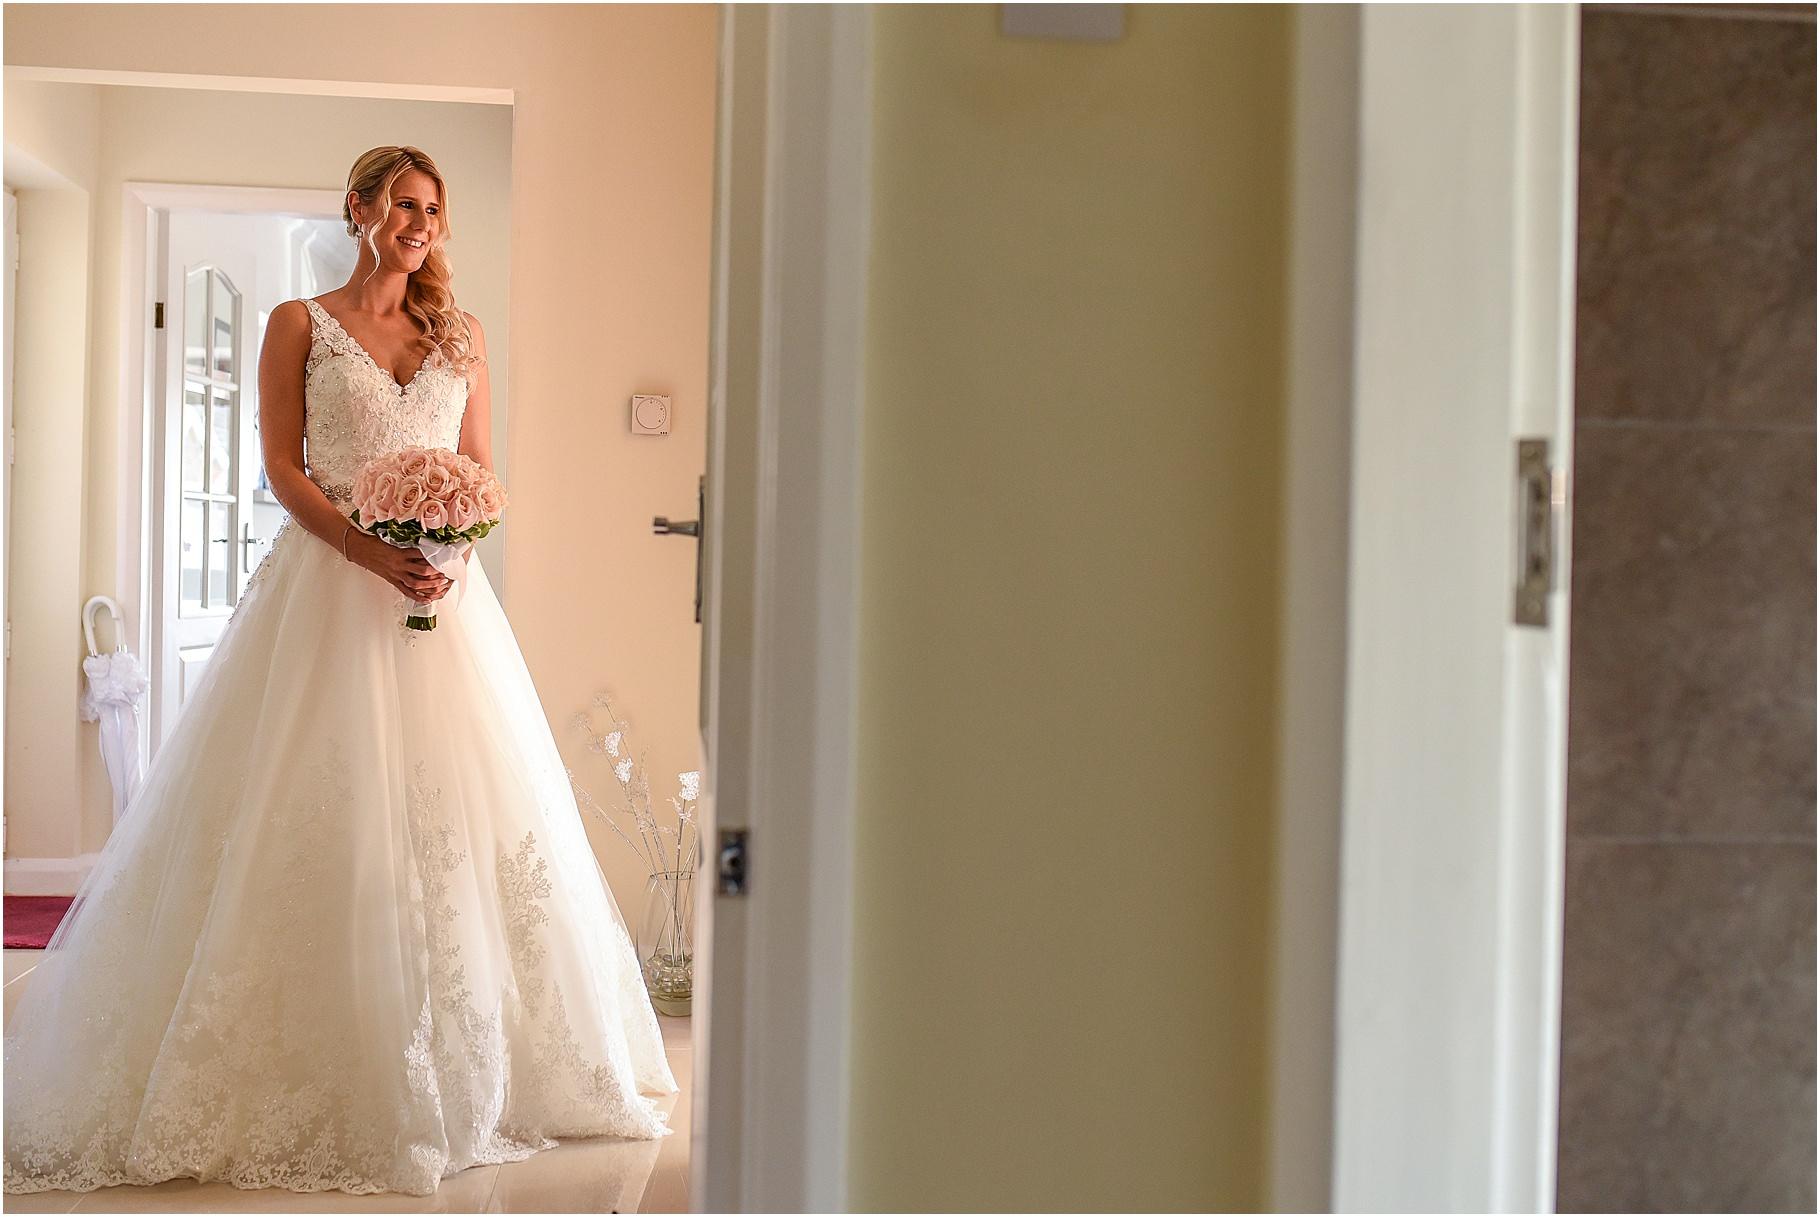 the-villa-wrea-green-wedding-21.jpg